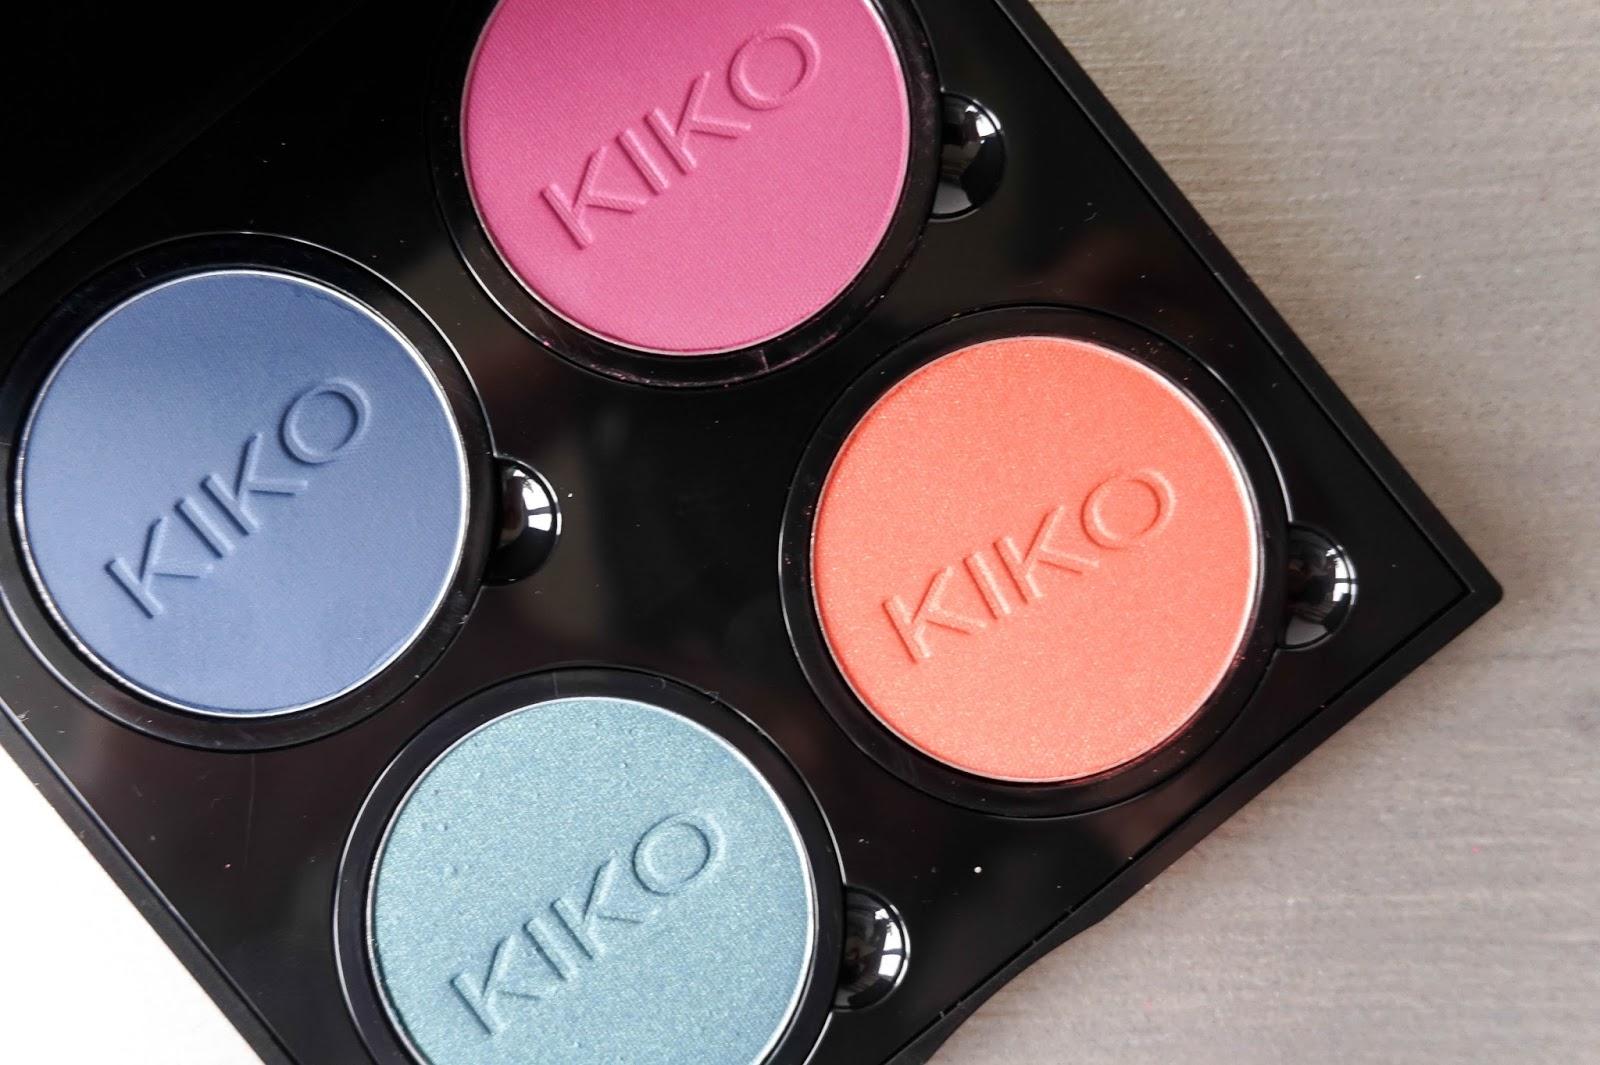 KIKO Infinity Eyeshadows